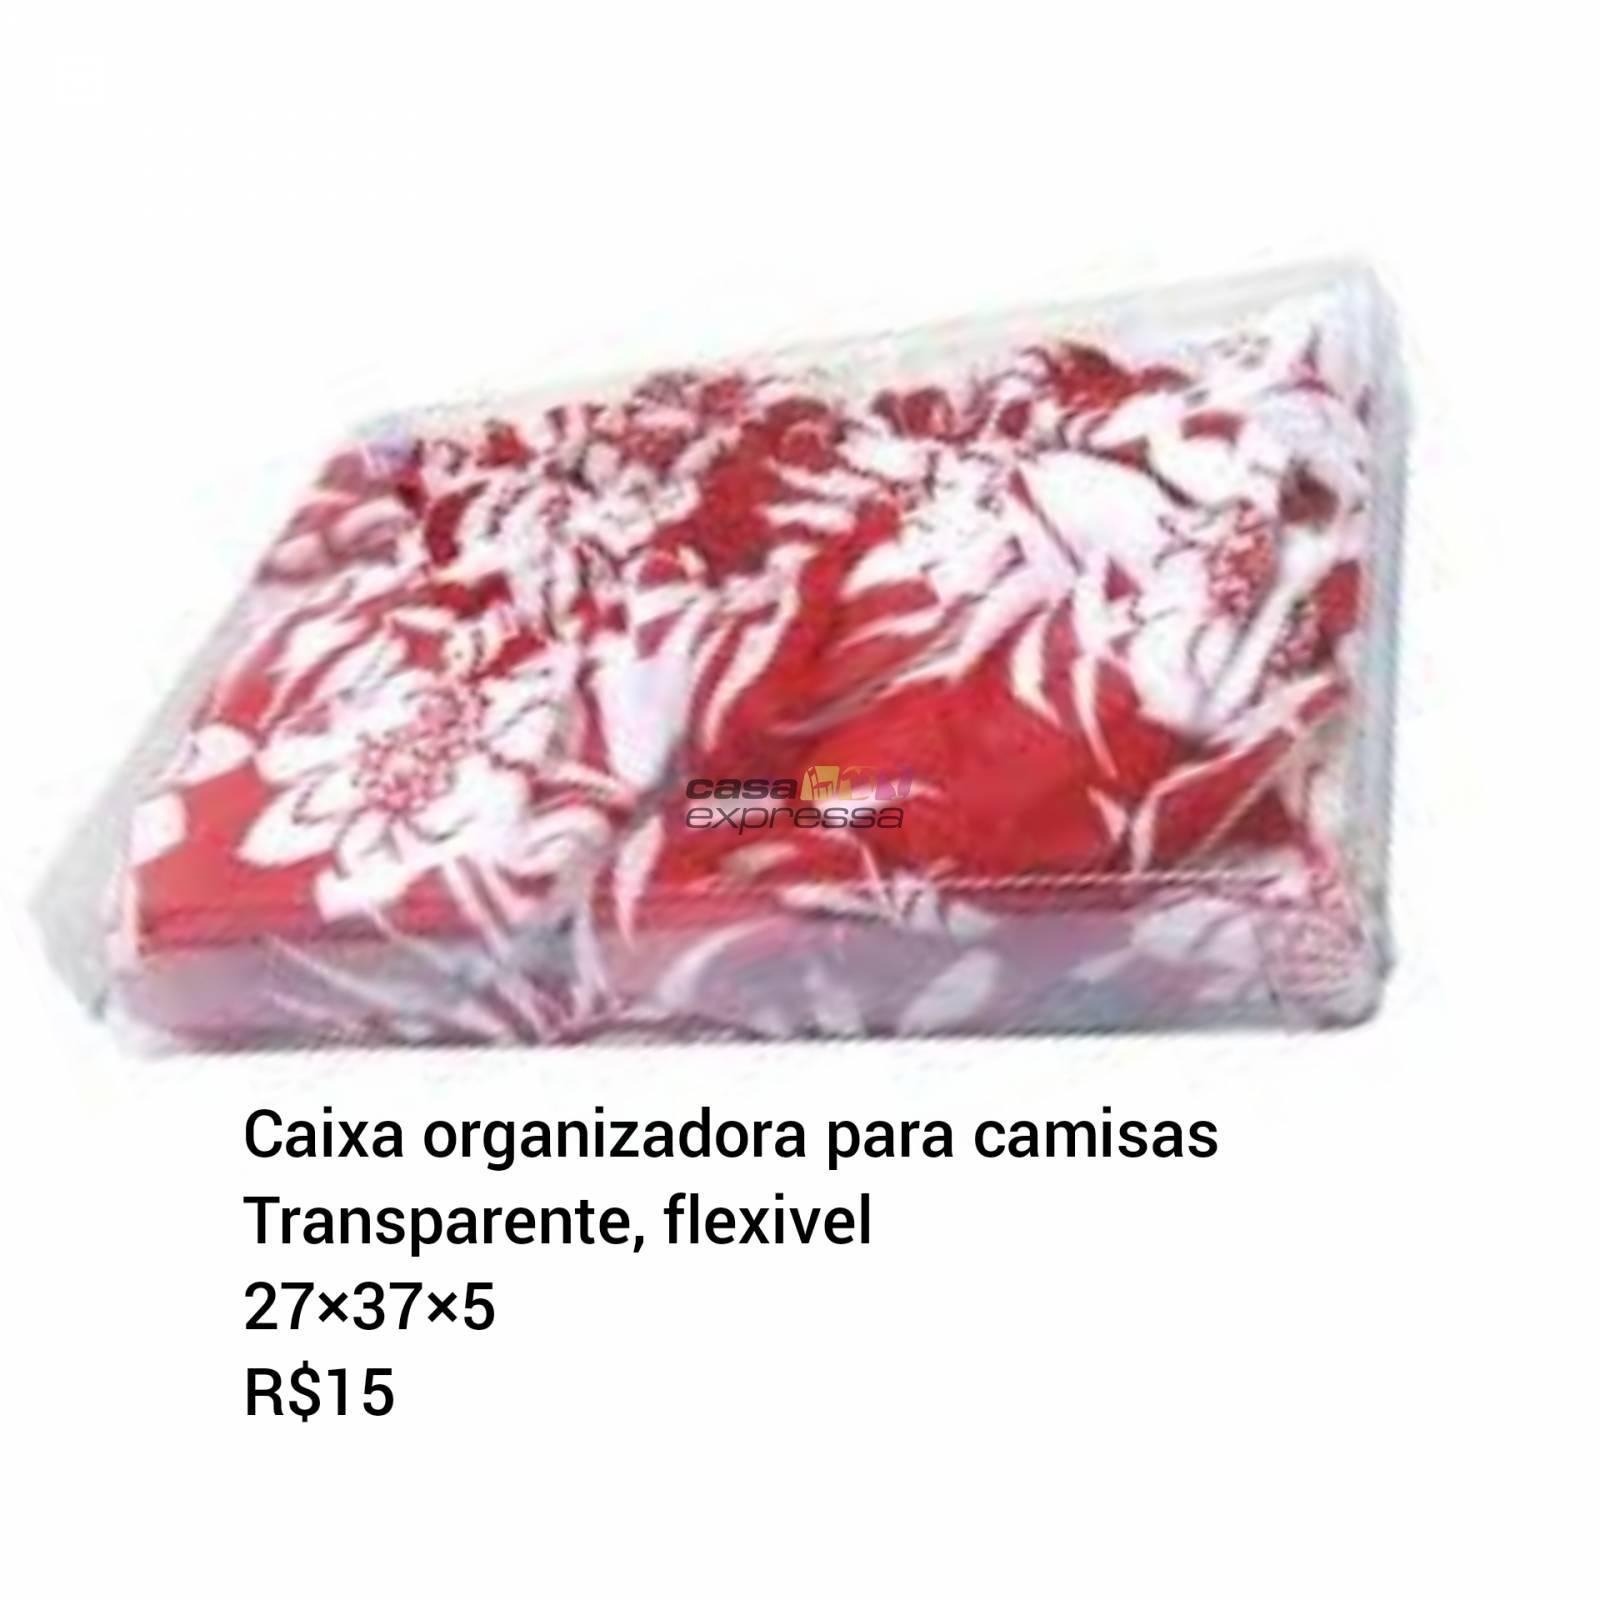 Caixa Organizadora para Camisas - CASA EXPRESSA